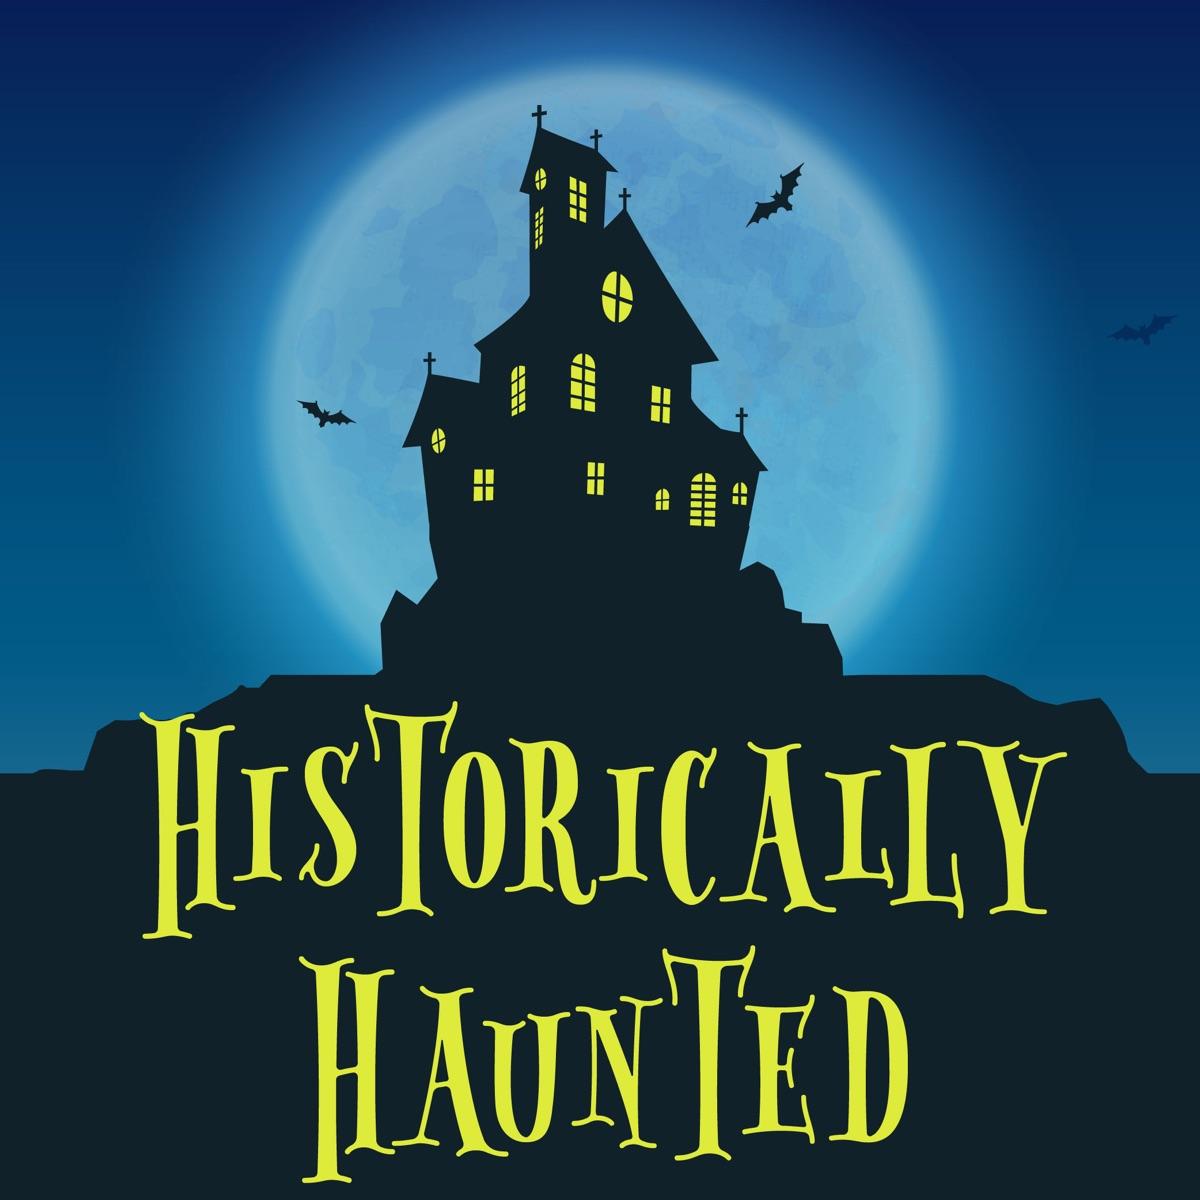 Historically Haunted